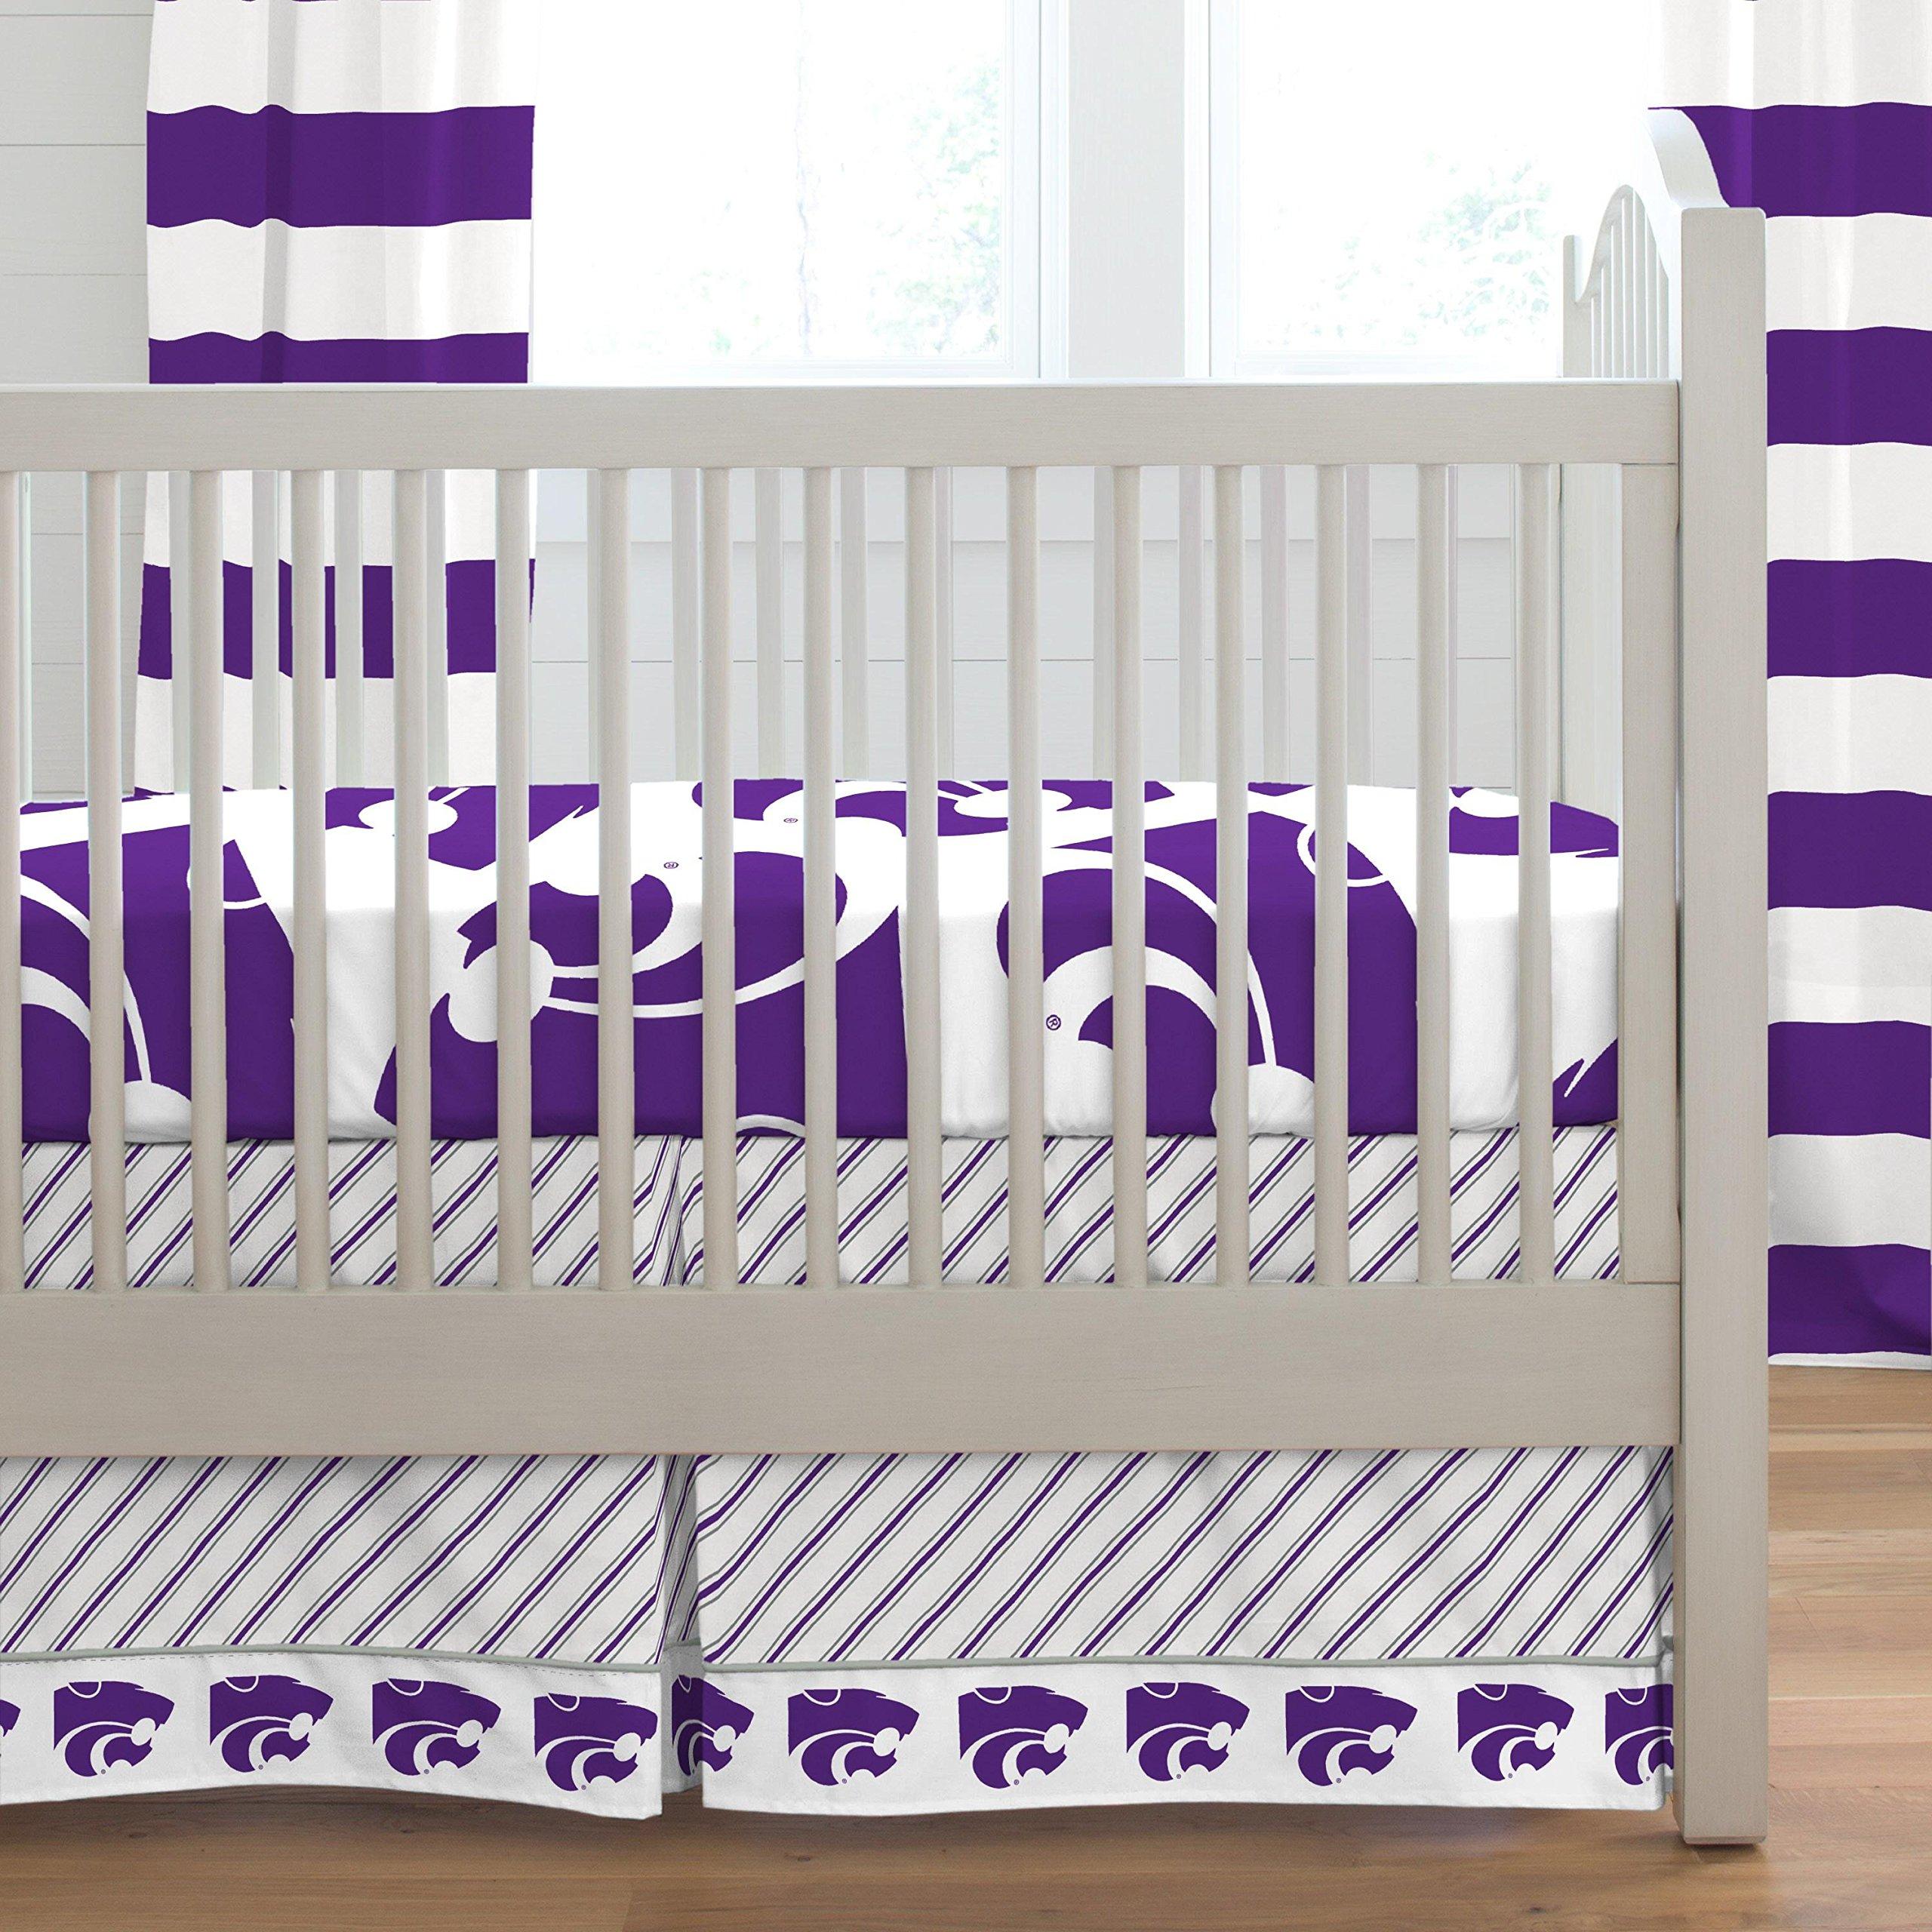 Carousel Designs Kansas State Crib Skirt Box Pleat 20-Inch Length